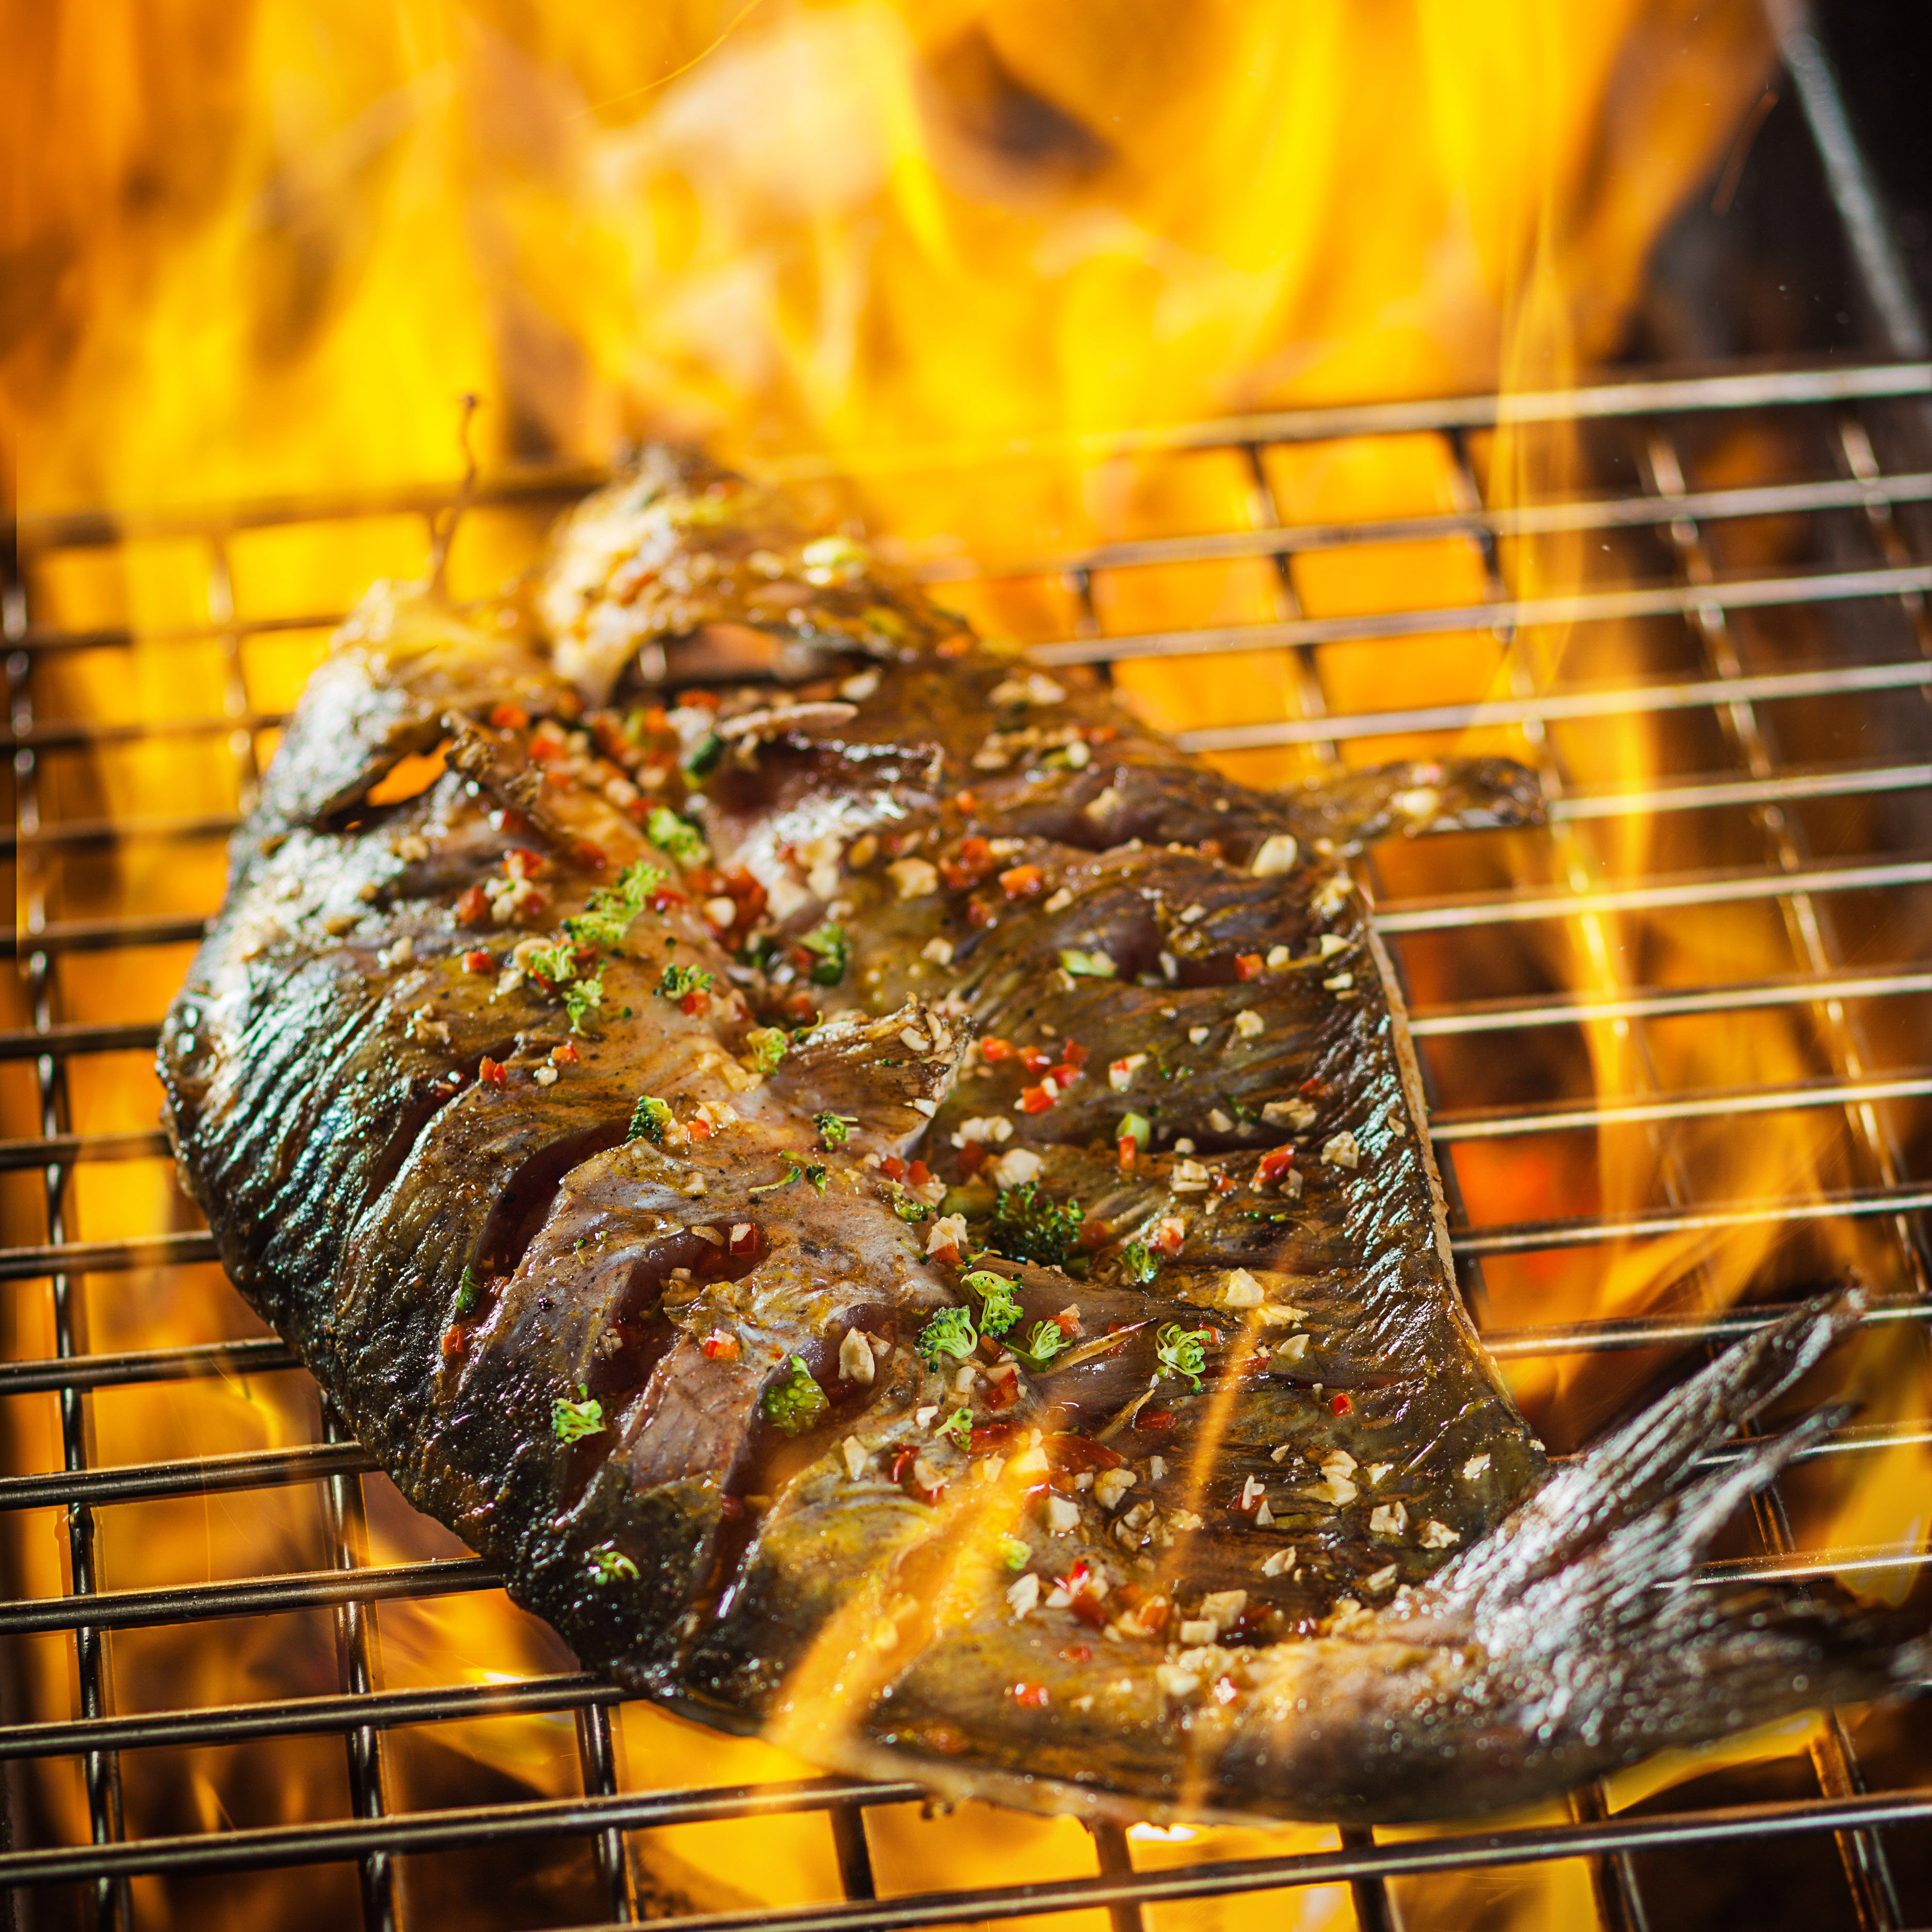 трафаретов для рыба на огне рецепты с фото техники предусматривают